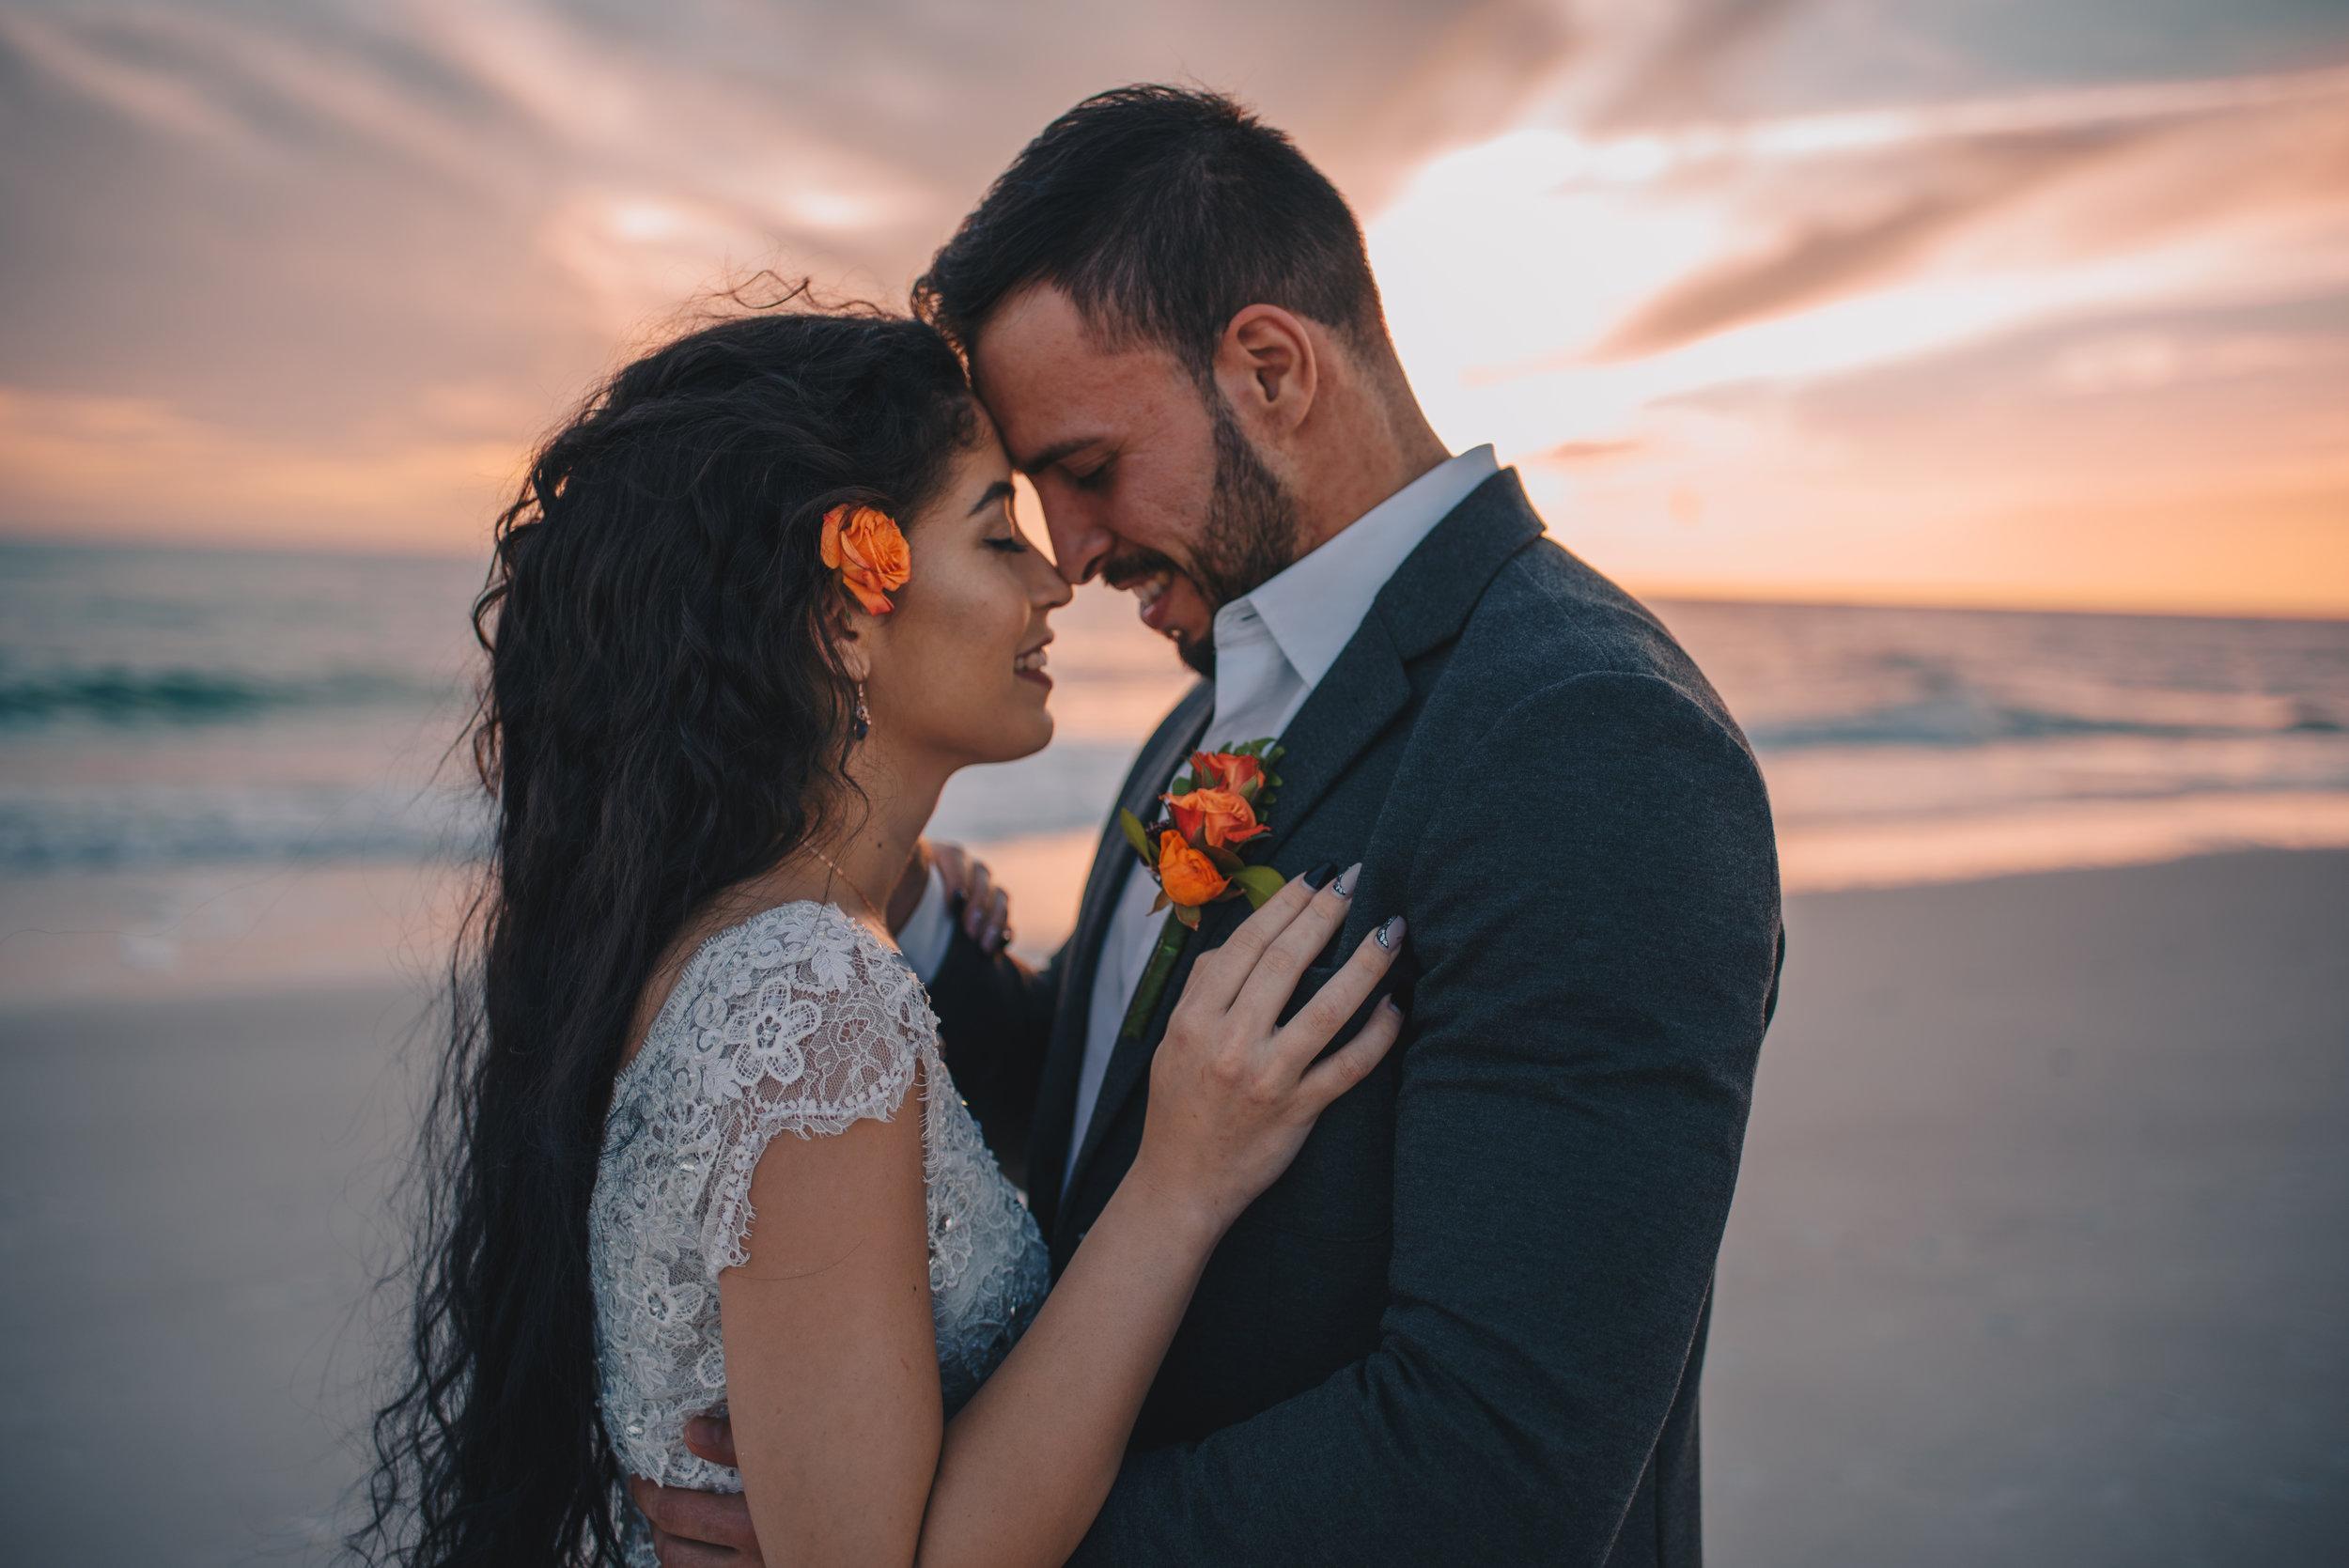 Bryan + Gleidys | Moana Inspired Wedding